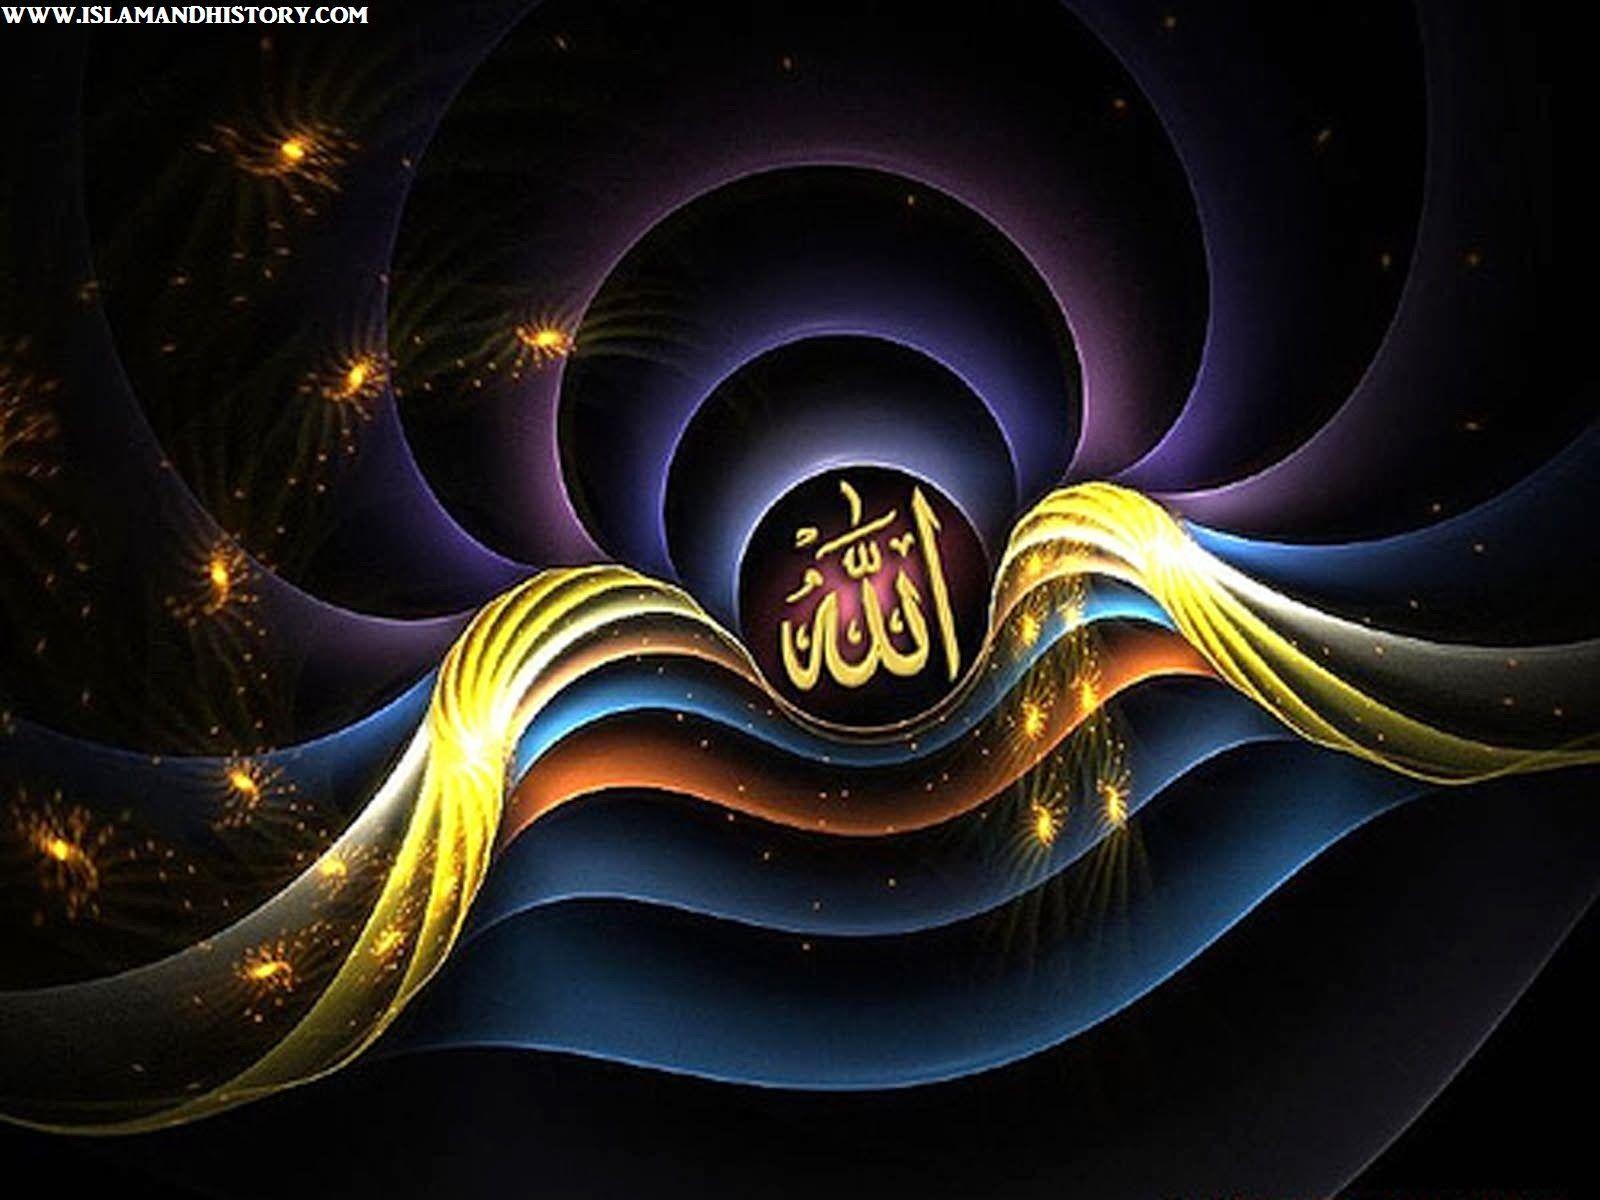 Allah Name Wallpaper, Allah Is One, #26543